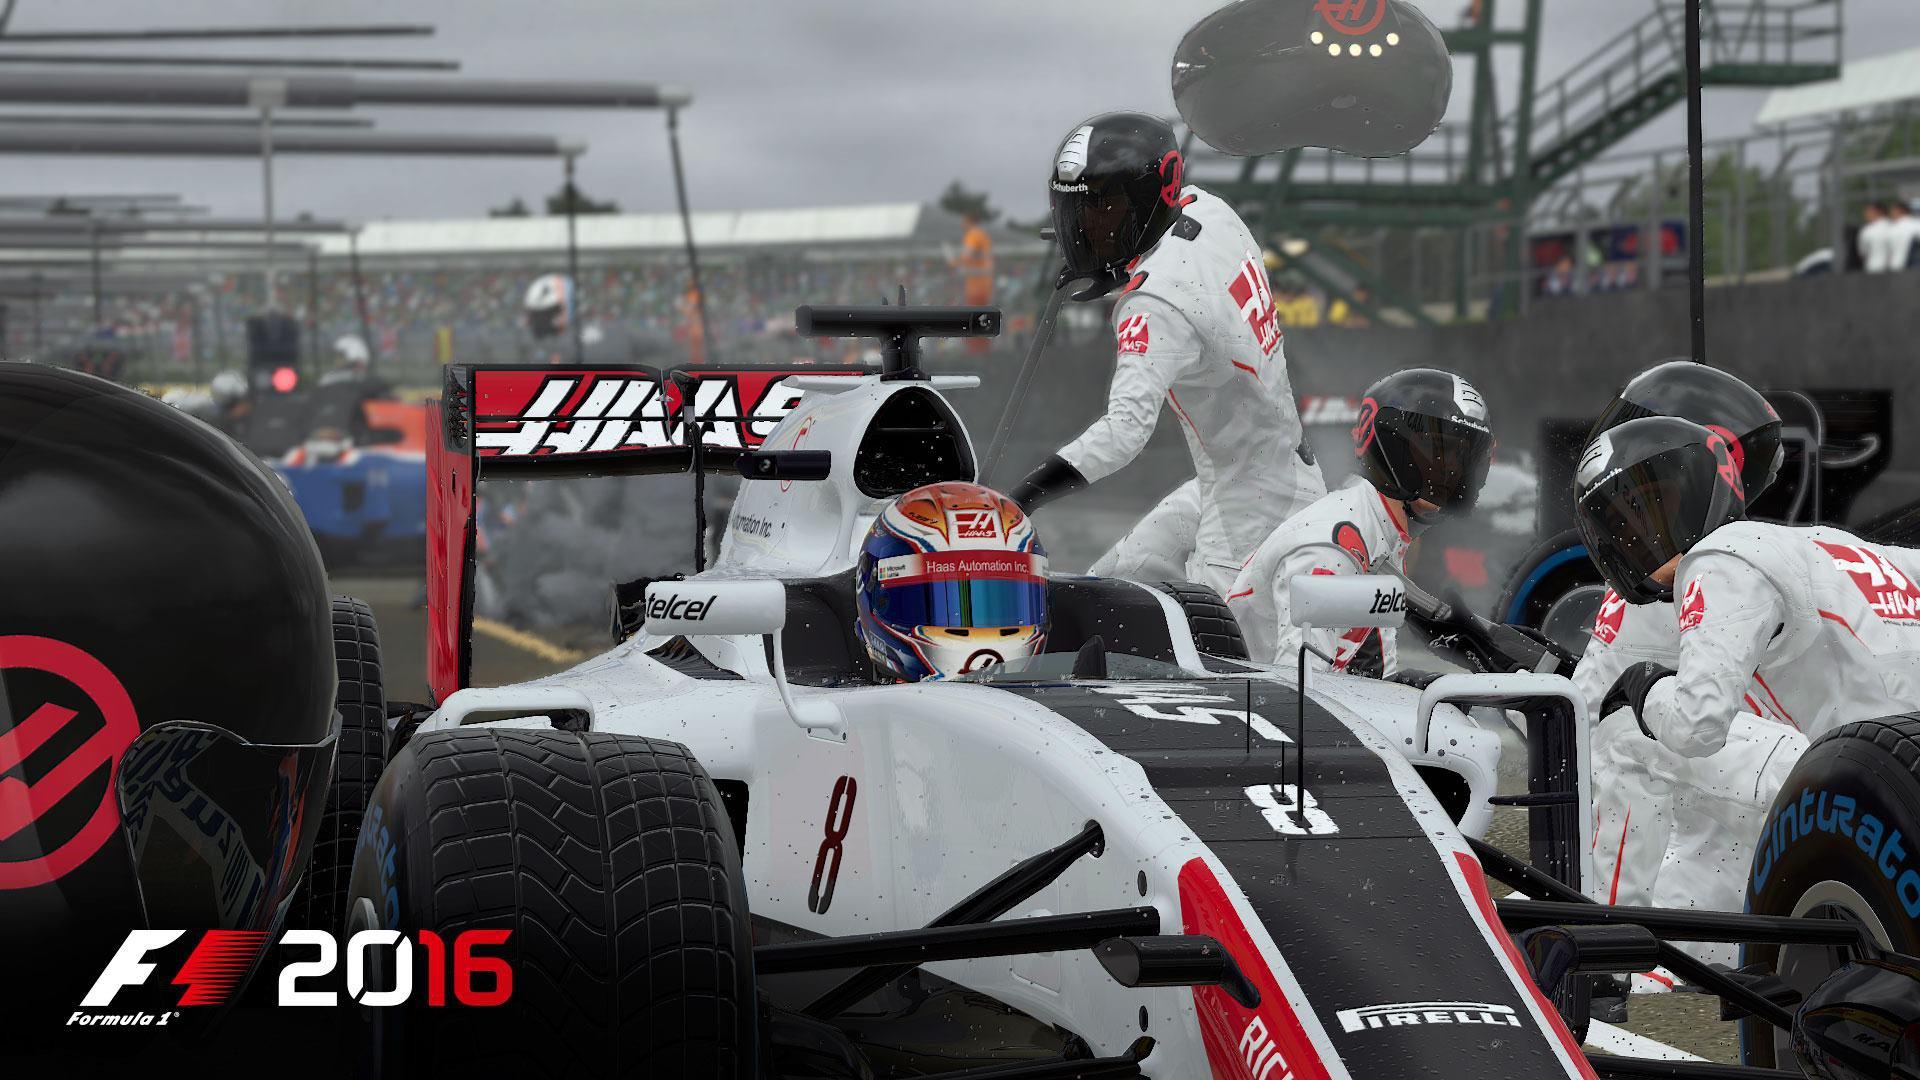 F1 2016 8